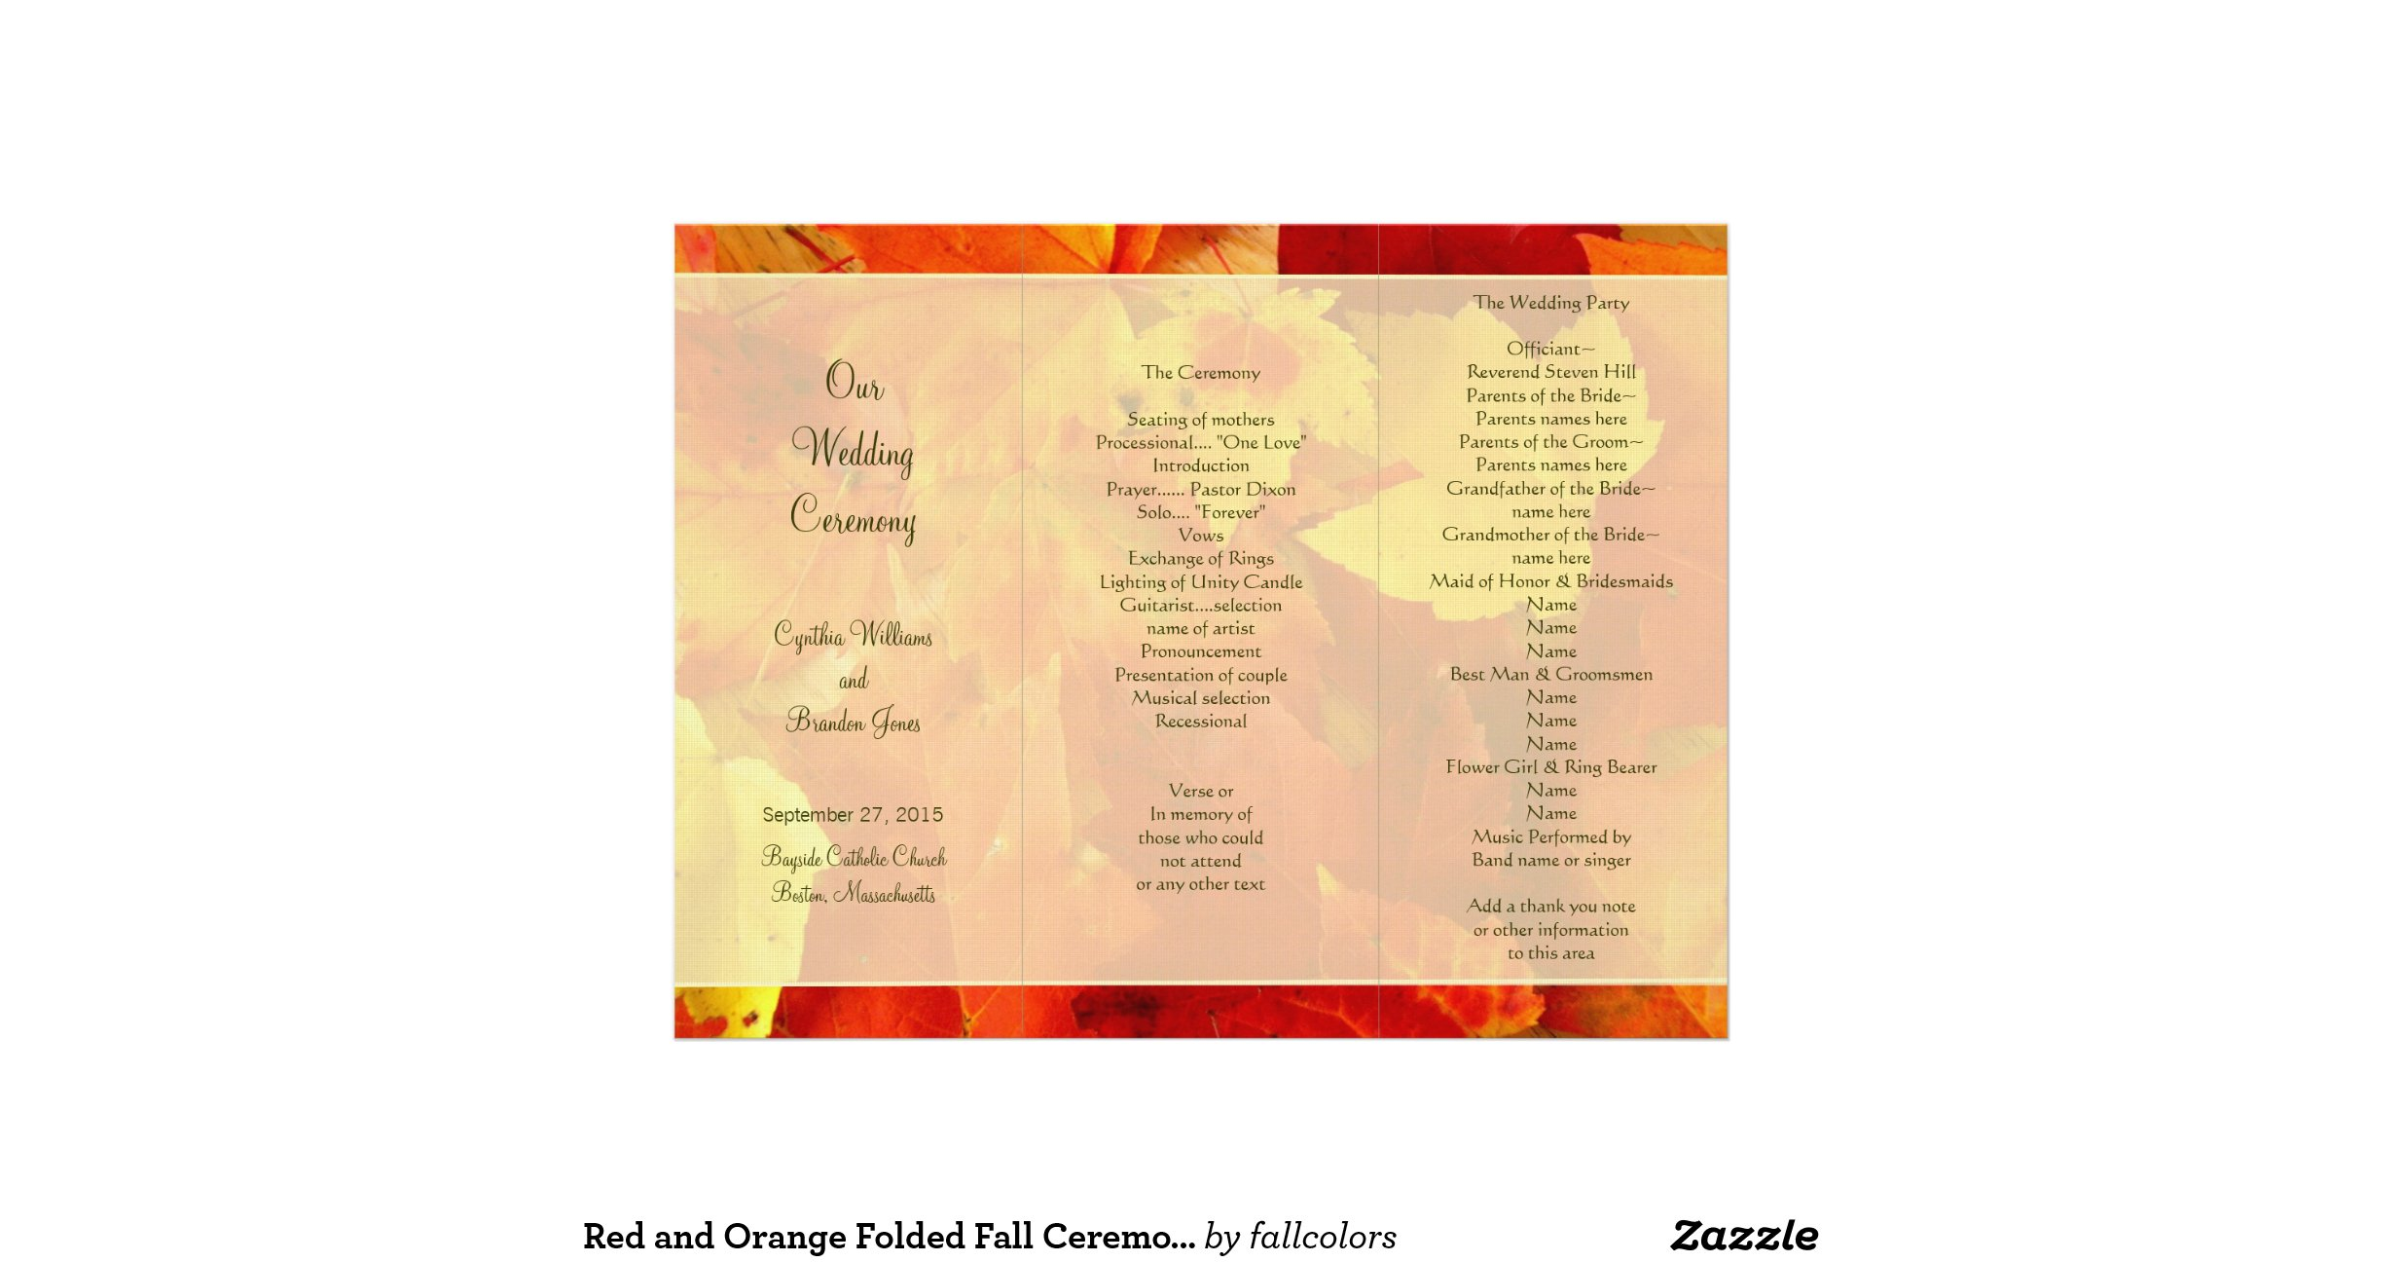 Autumn Scent Tri Fold Wedding Program Template Letterhead R602d915d354345d2a32cd64471393b57